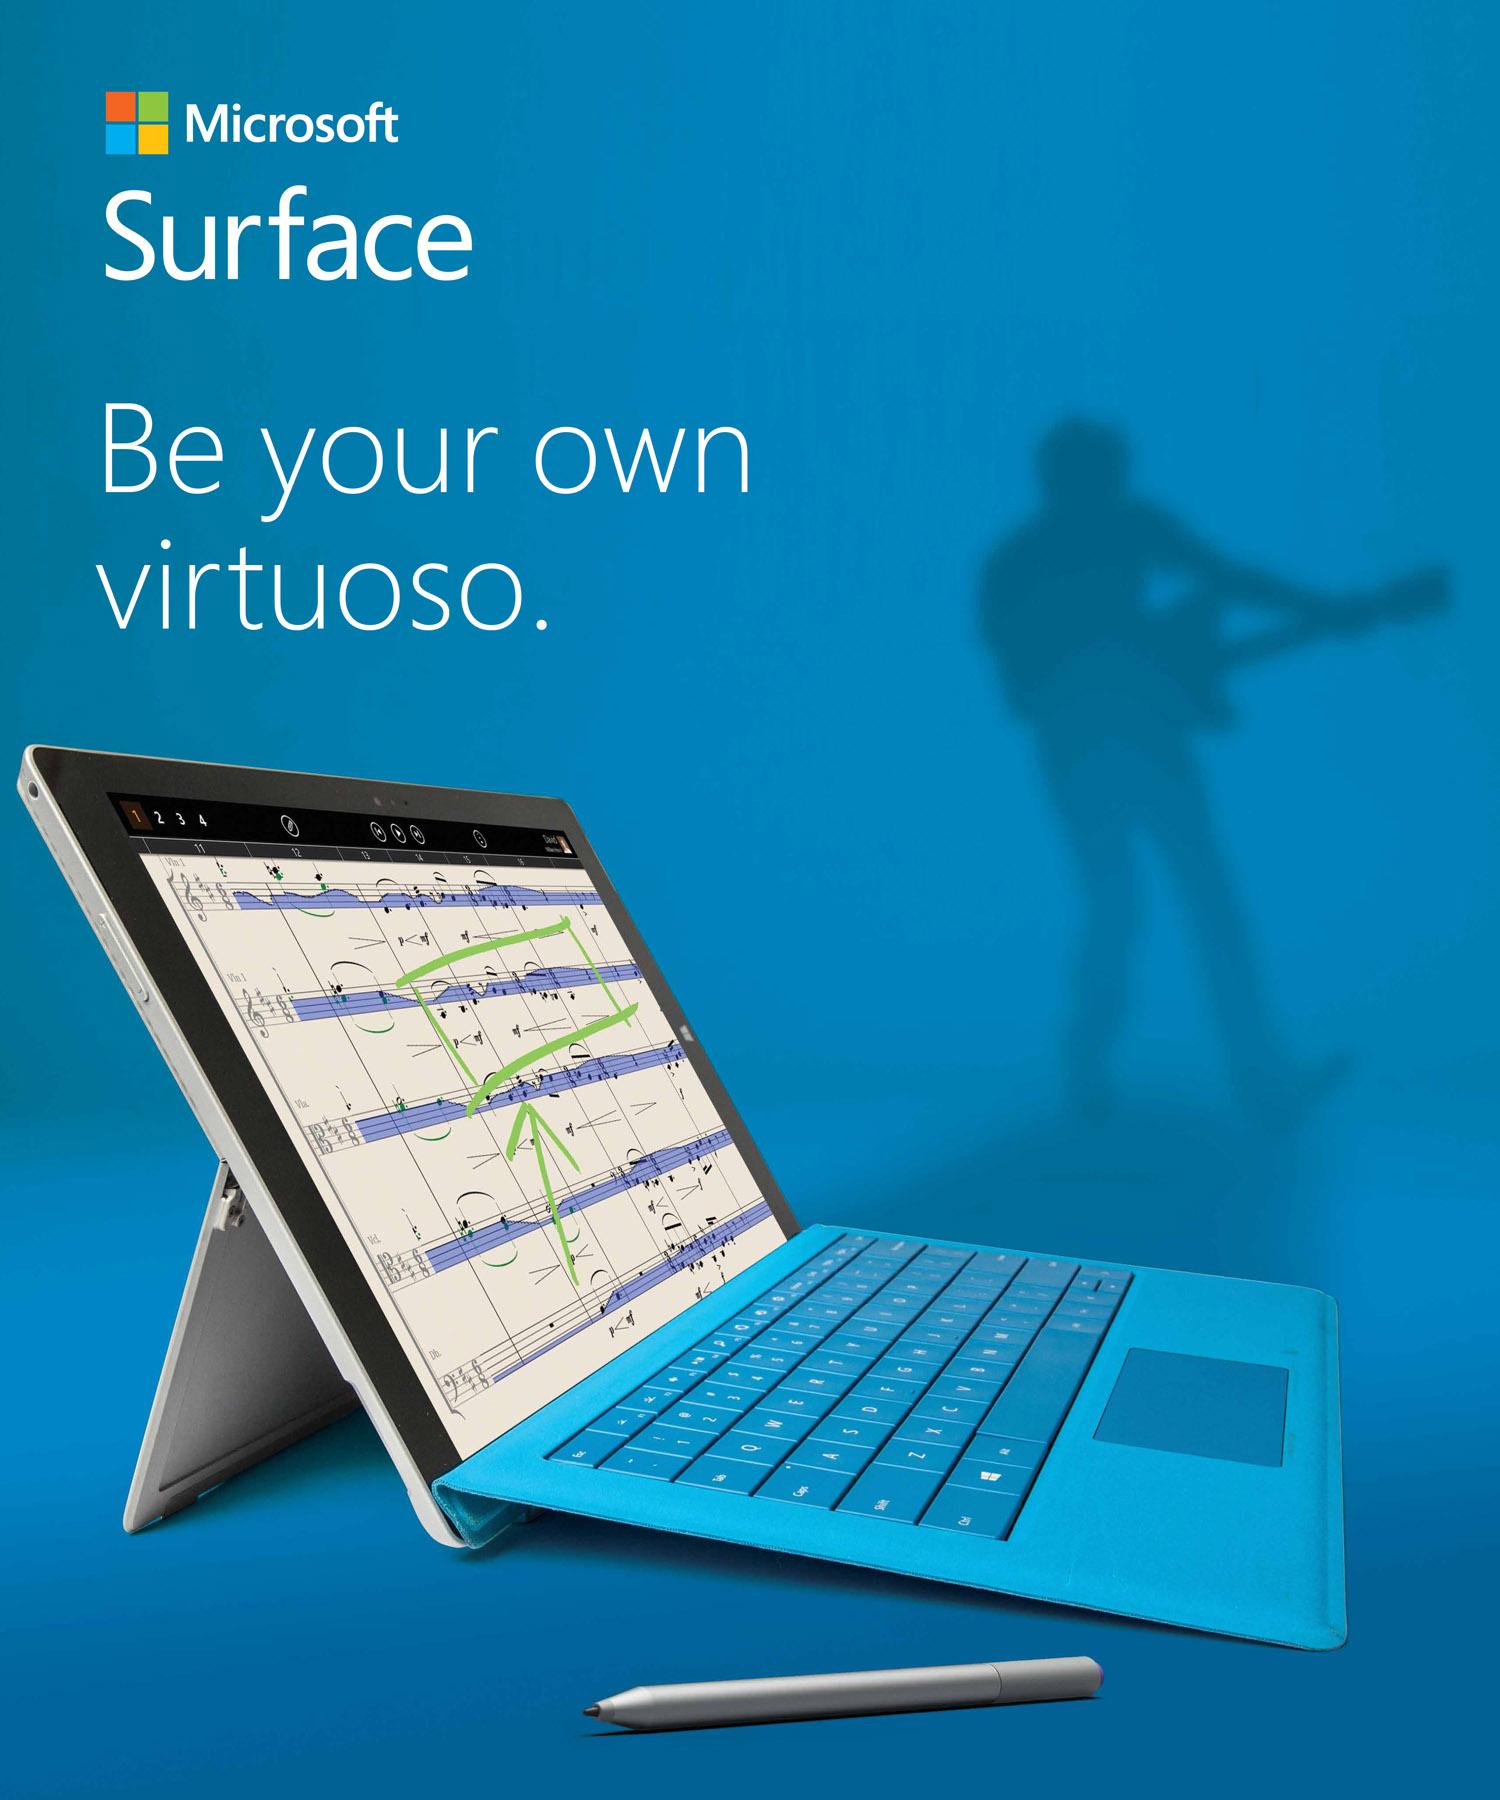 microsoft-virtuoso1500x1800.jpg